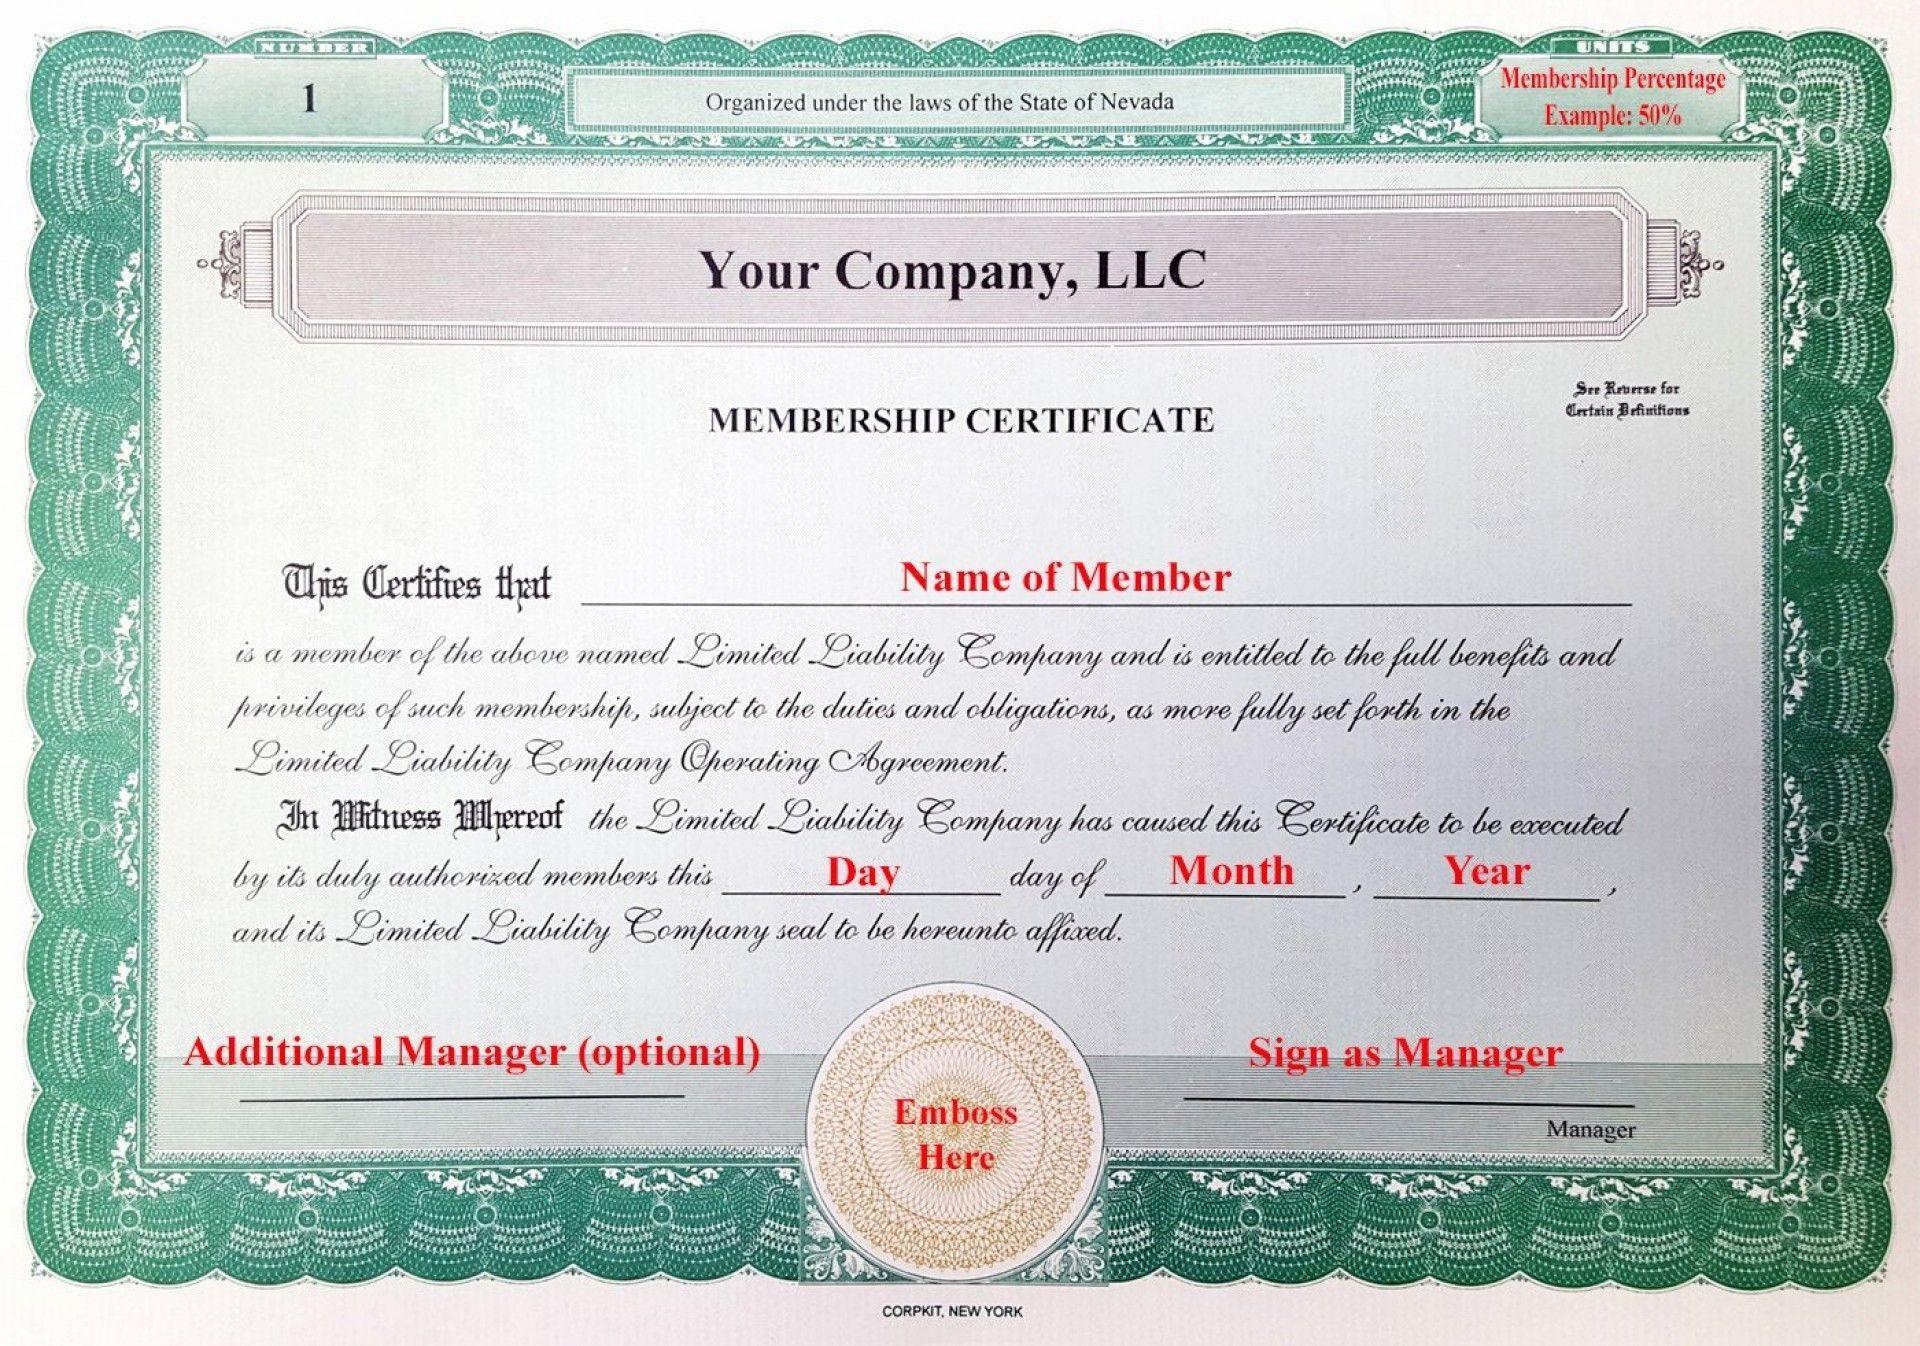 001 Frightening Llc Membership Certificate Template Example  Interest Free Member1920